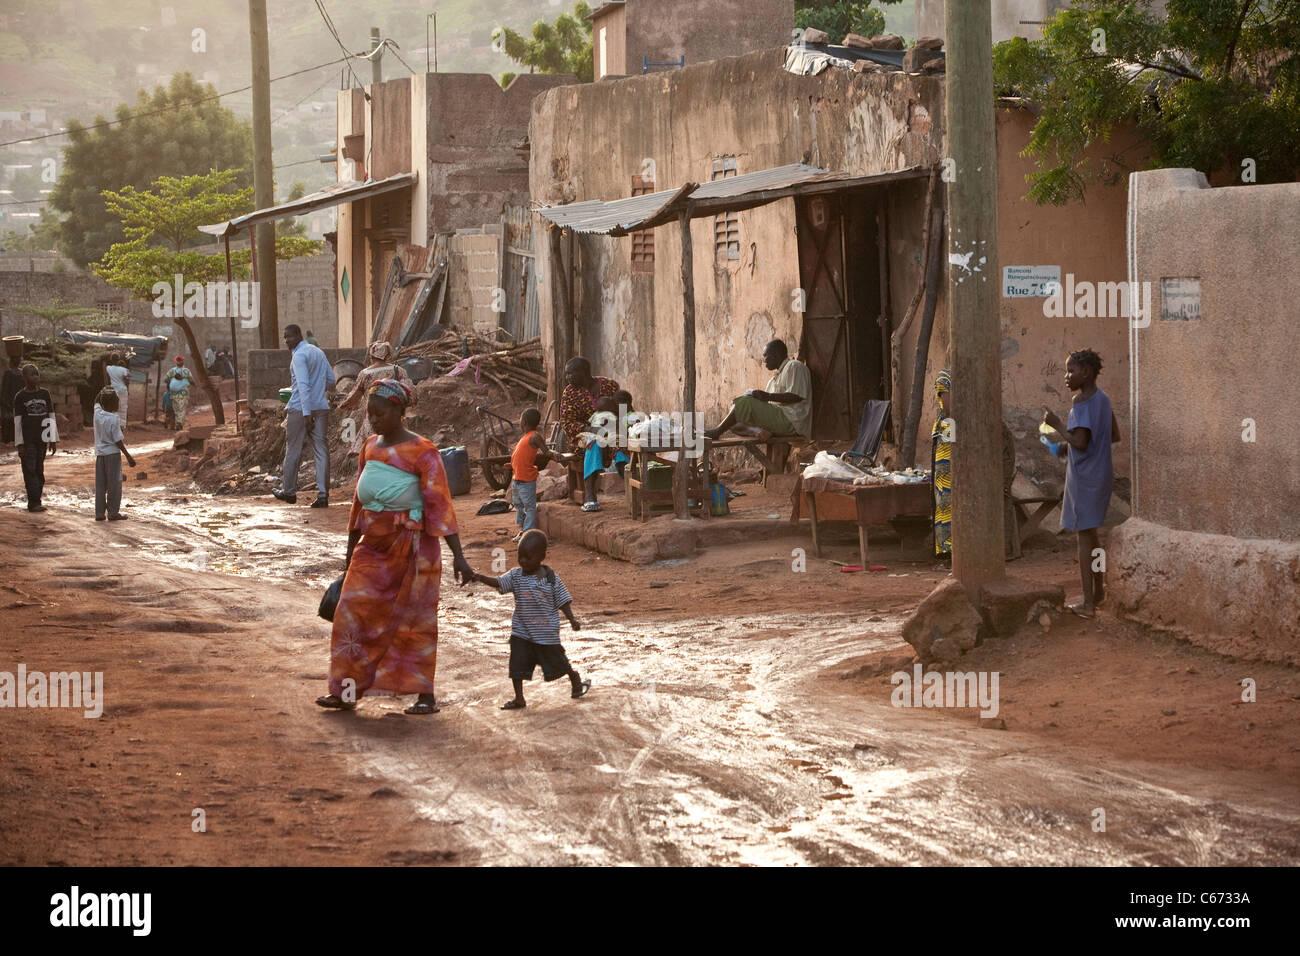 Kadija Bagayoko and her family live in Banconi, a crowded suburb of Bamako. PSI Mali. August - September, 2010. - Stock Image